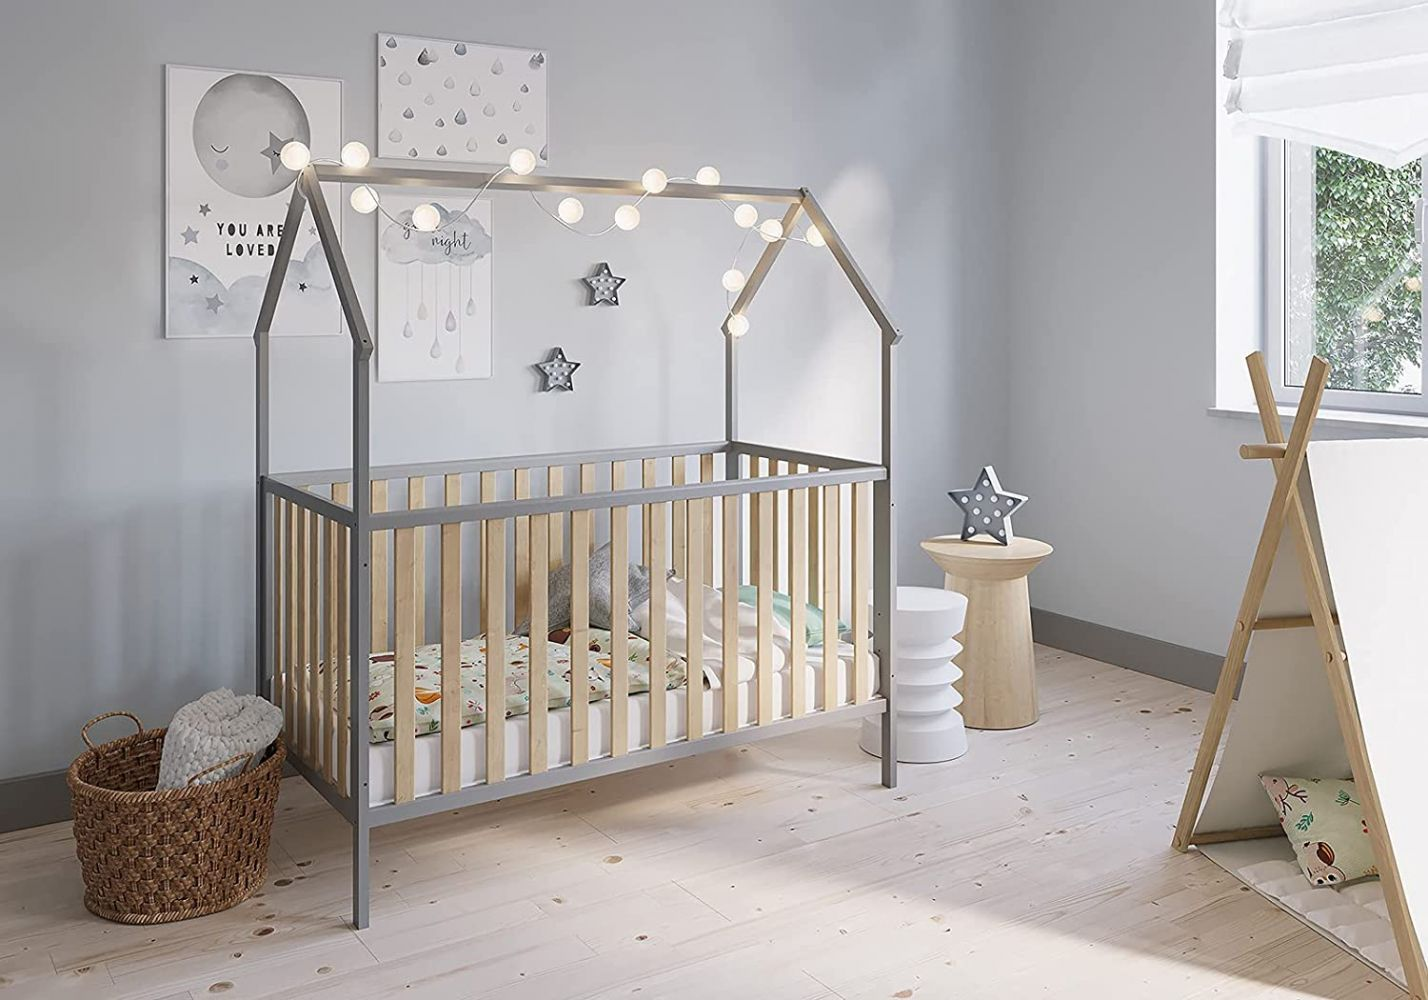 FabiMax 'Schlafmütze' Kinderbett, 70 x 140 cm, grau/natur, Kiefer massiv, 3-fach höhenverstellbar, umbaubar Bild 1